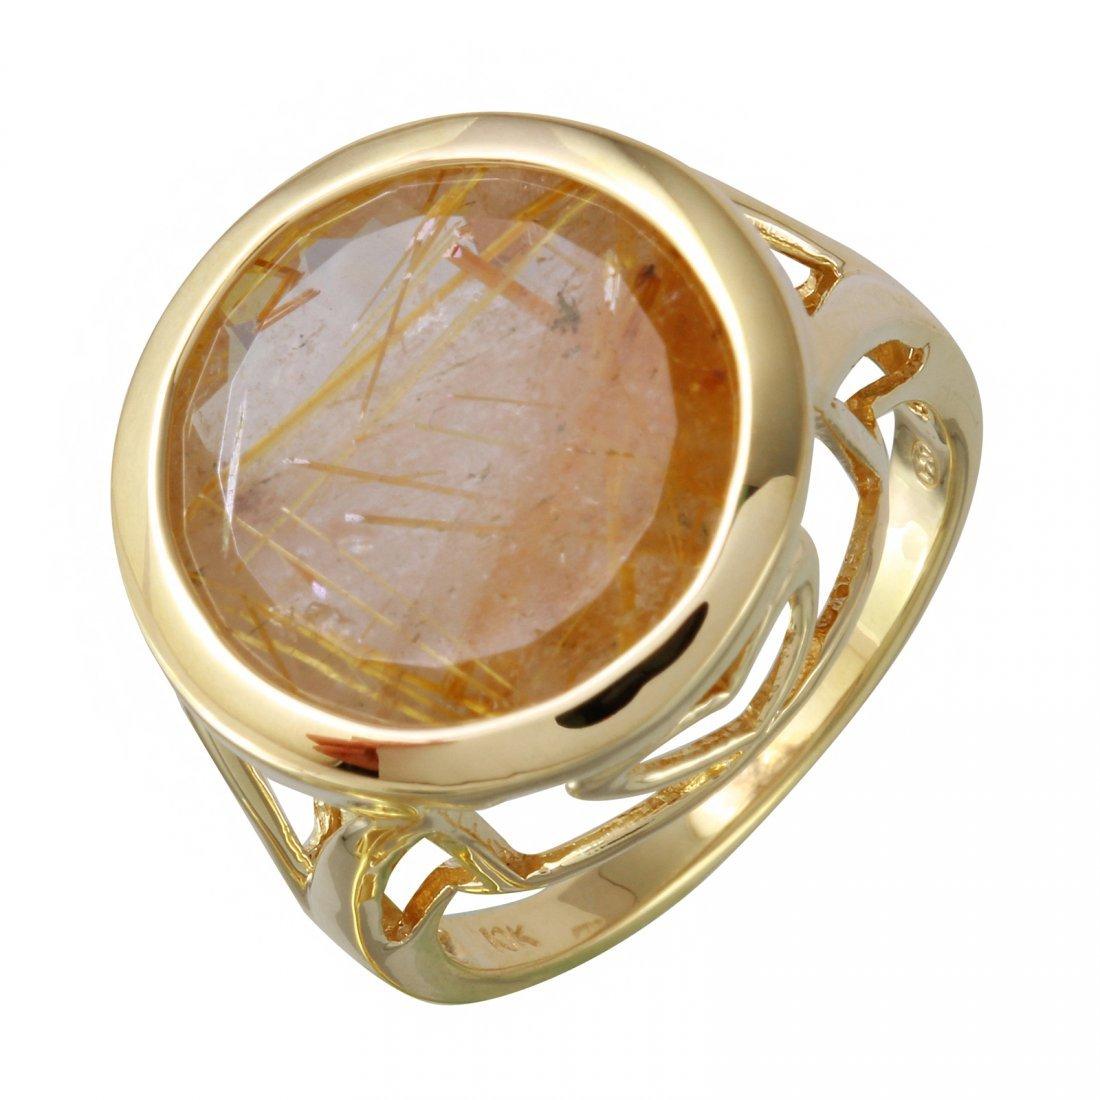 10K Yellow Gold Quartz Ring, 10 cts